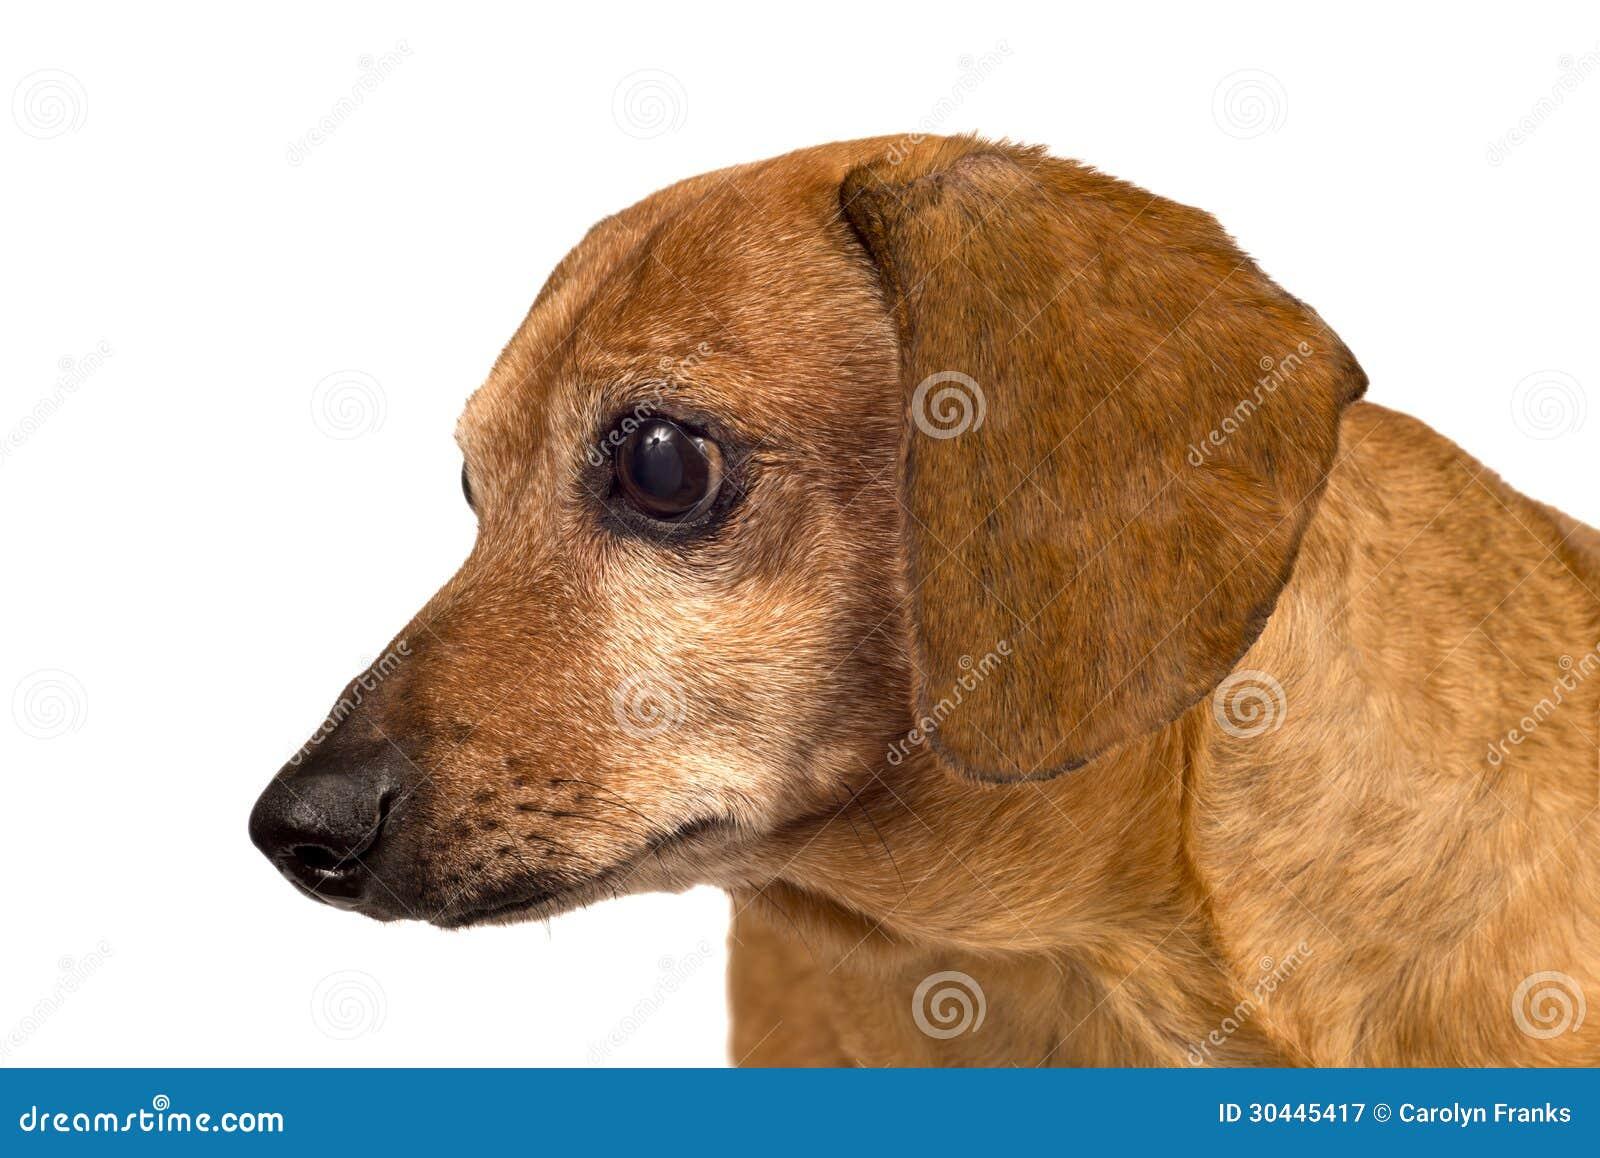 Dog Looking Sideways Close Up Stock Image - Image of